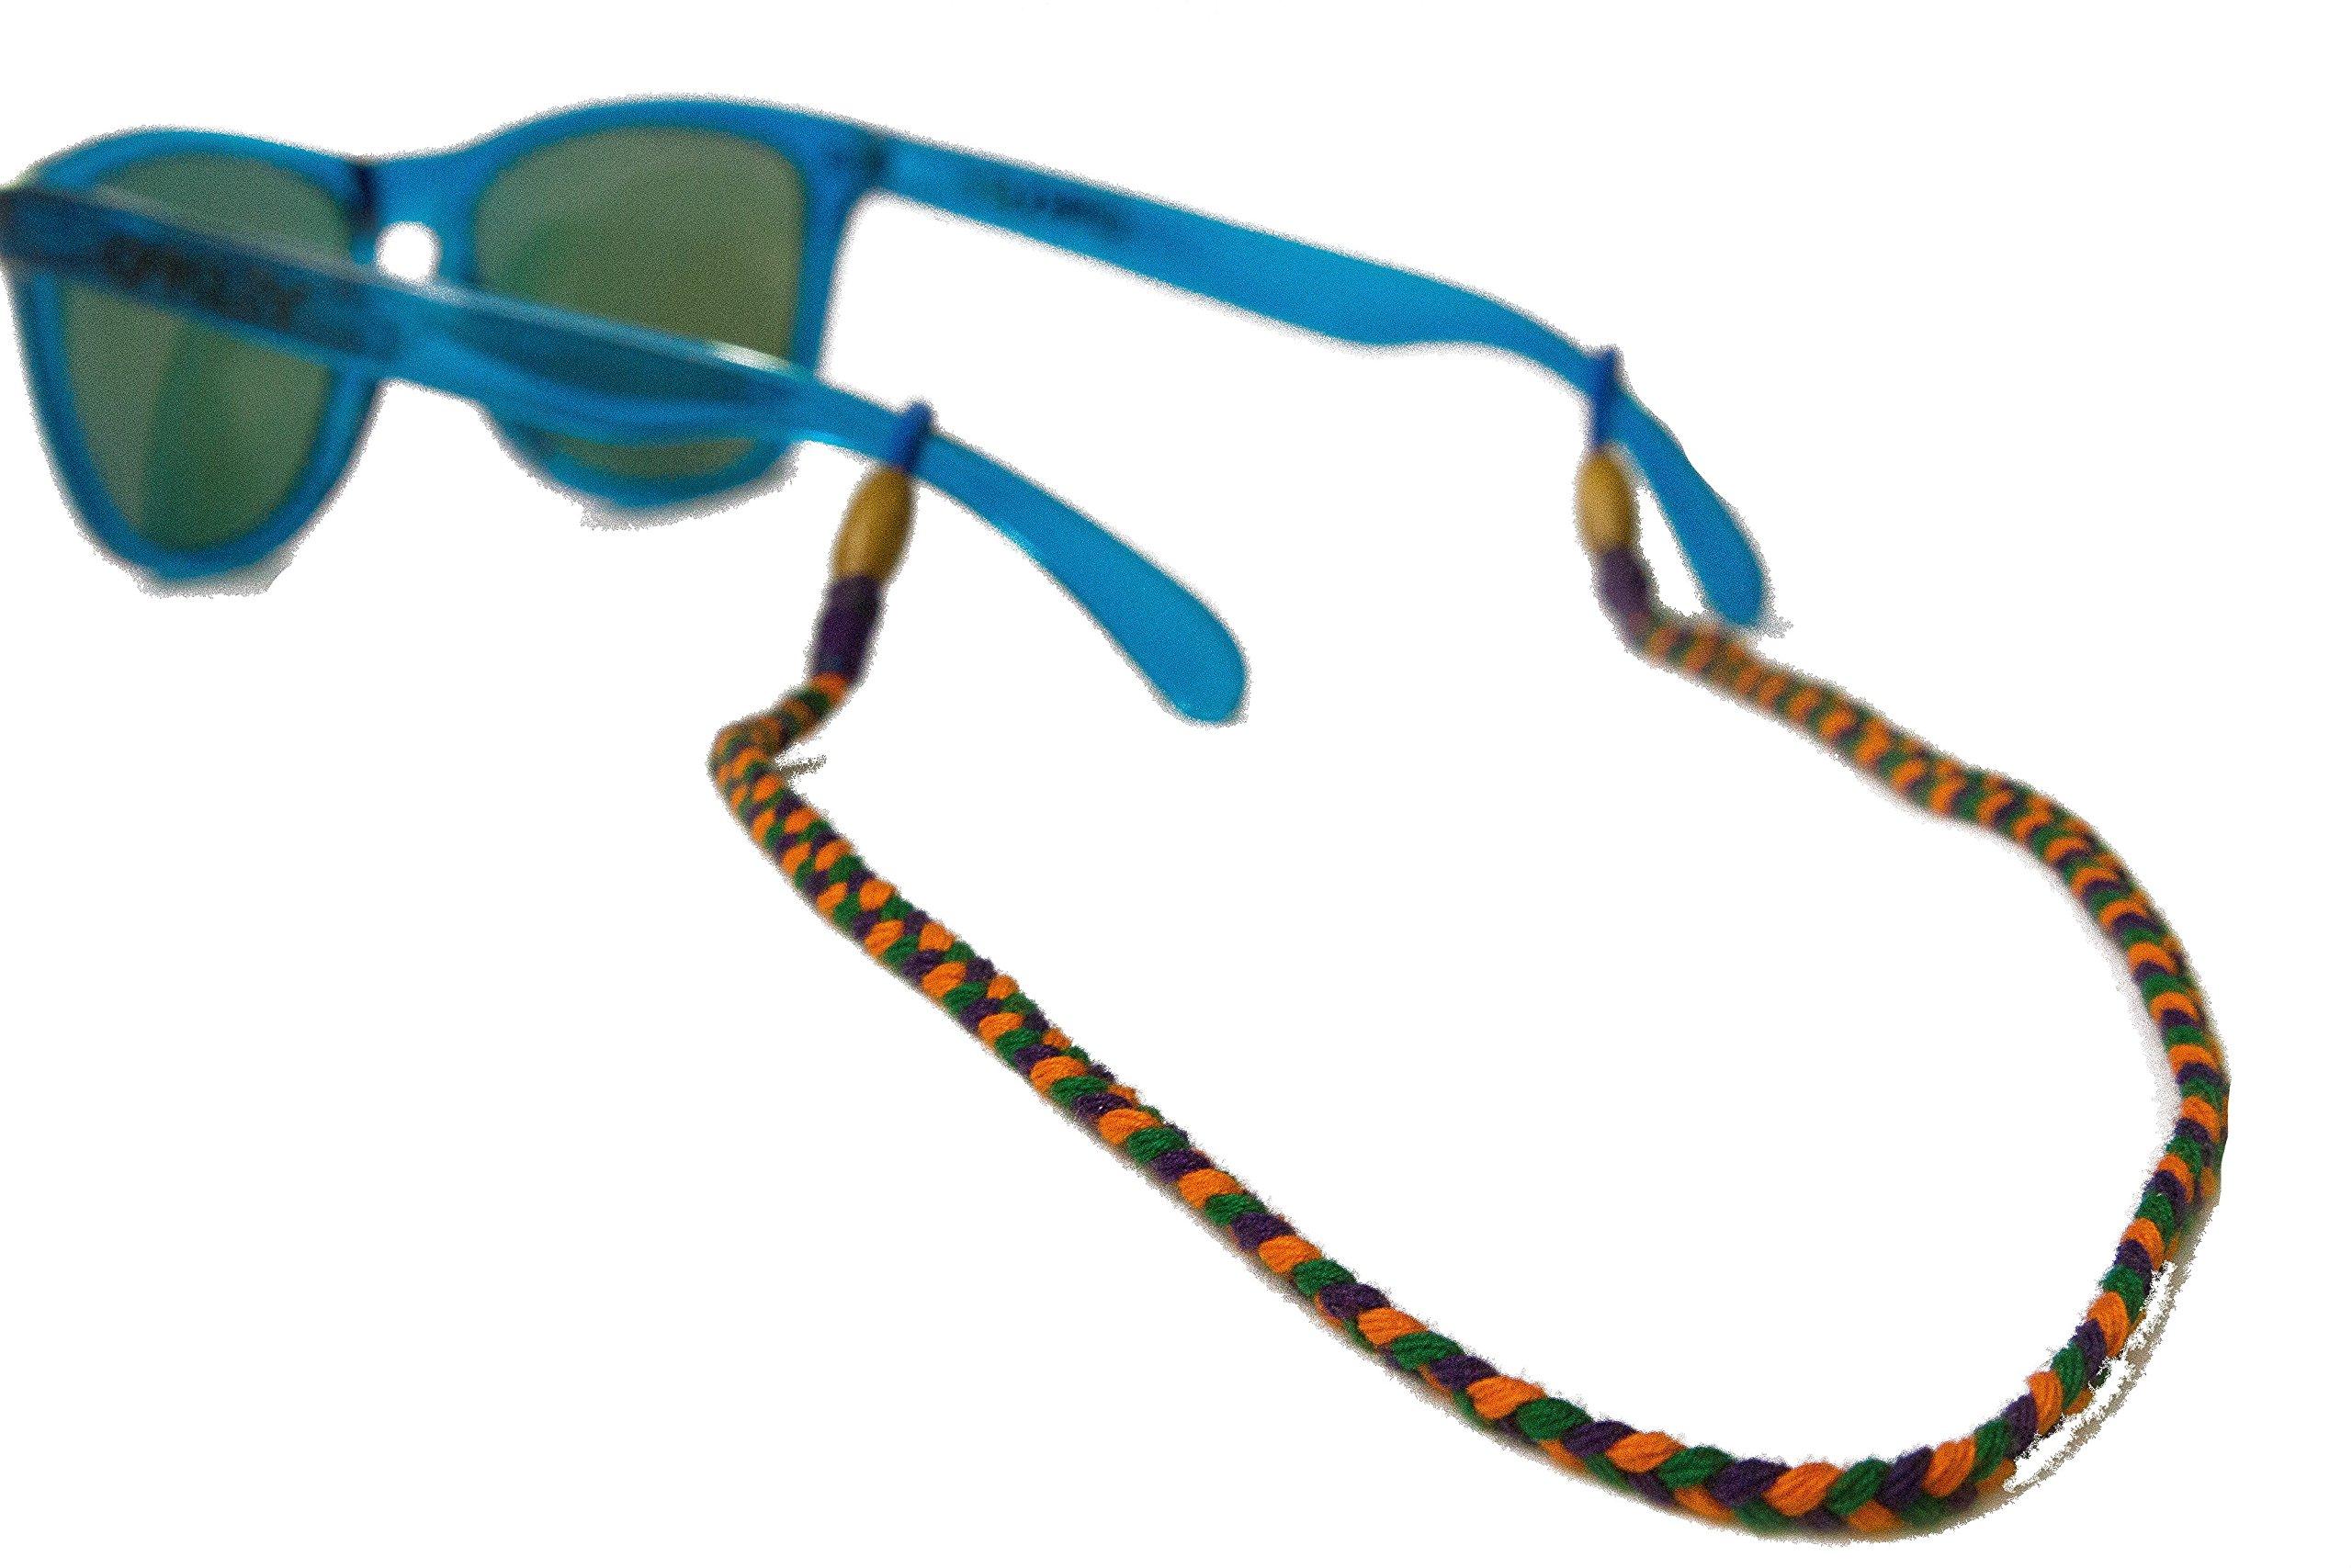 Adjustable Eyewear Retainer for Men – Handmade Sunglass Strap Holder - Universal Fit - Mayami